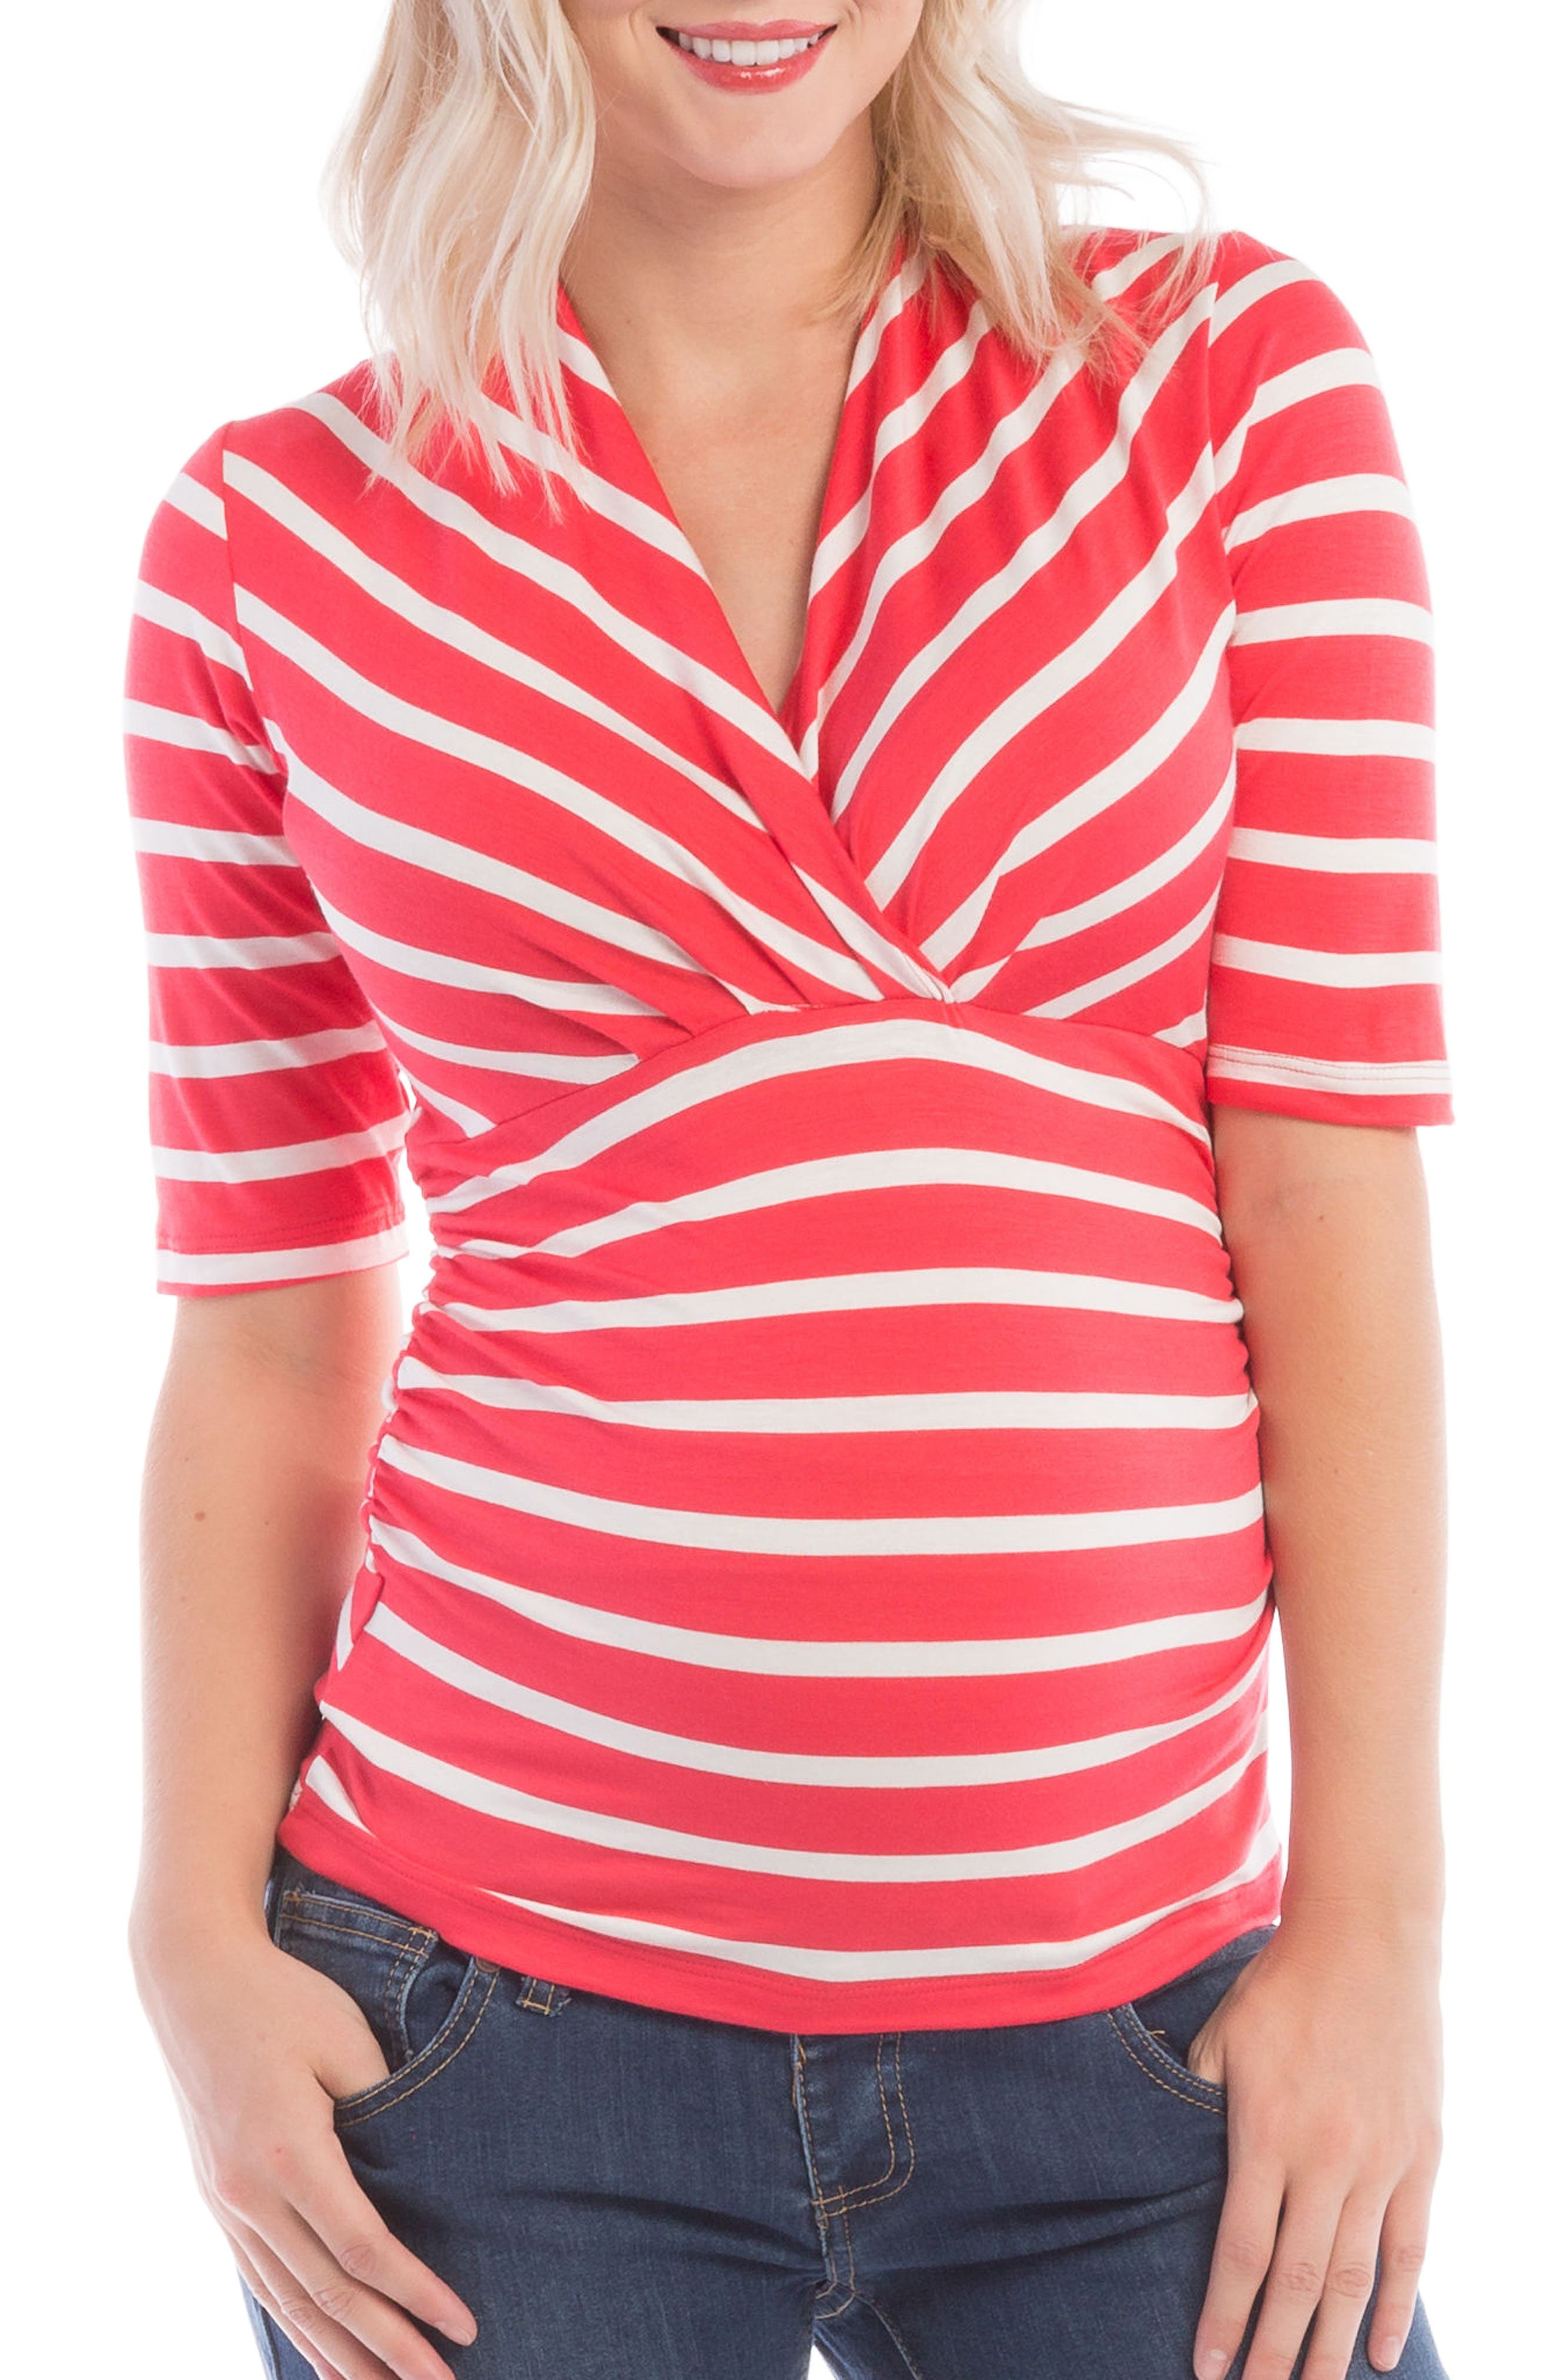 Alternate Image 1 Selected - Lilac Clothing Megan Maternity/Nursing Top